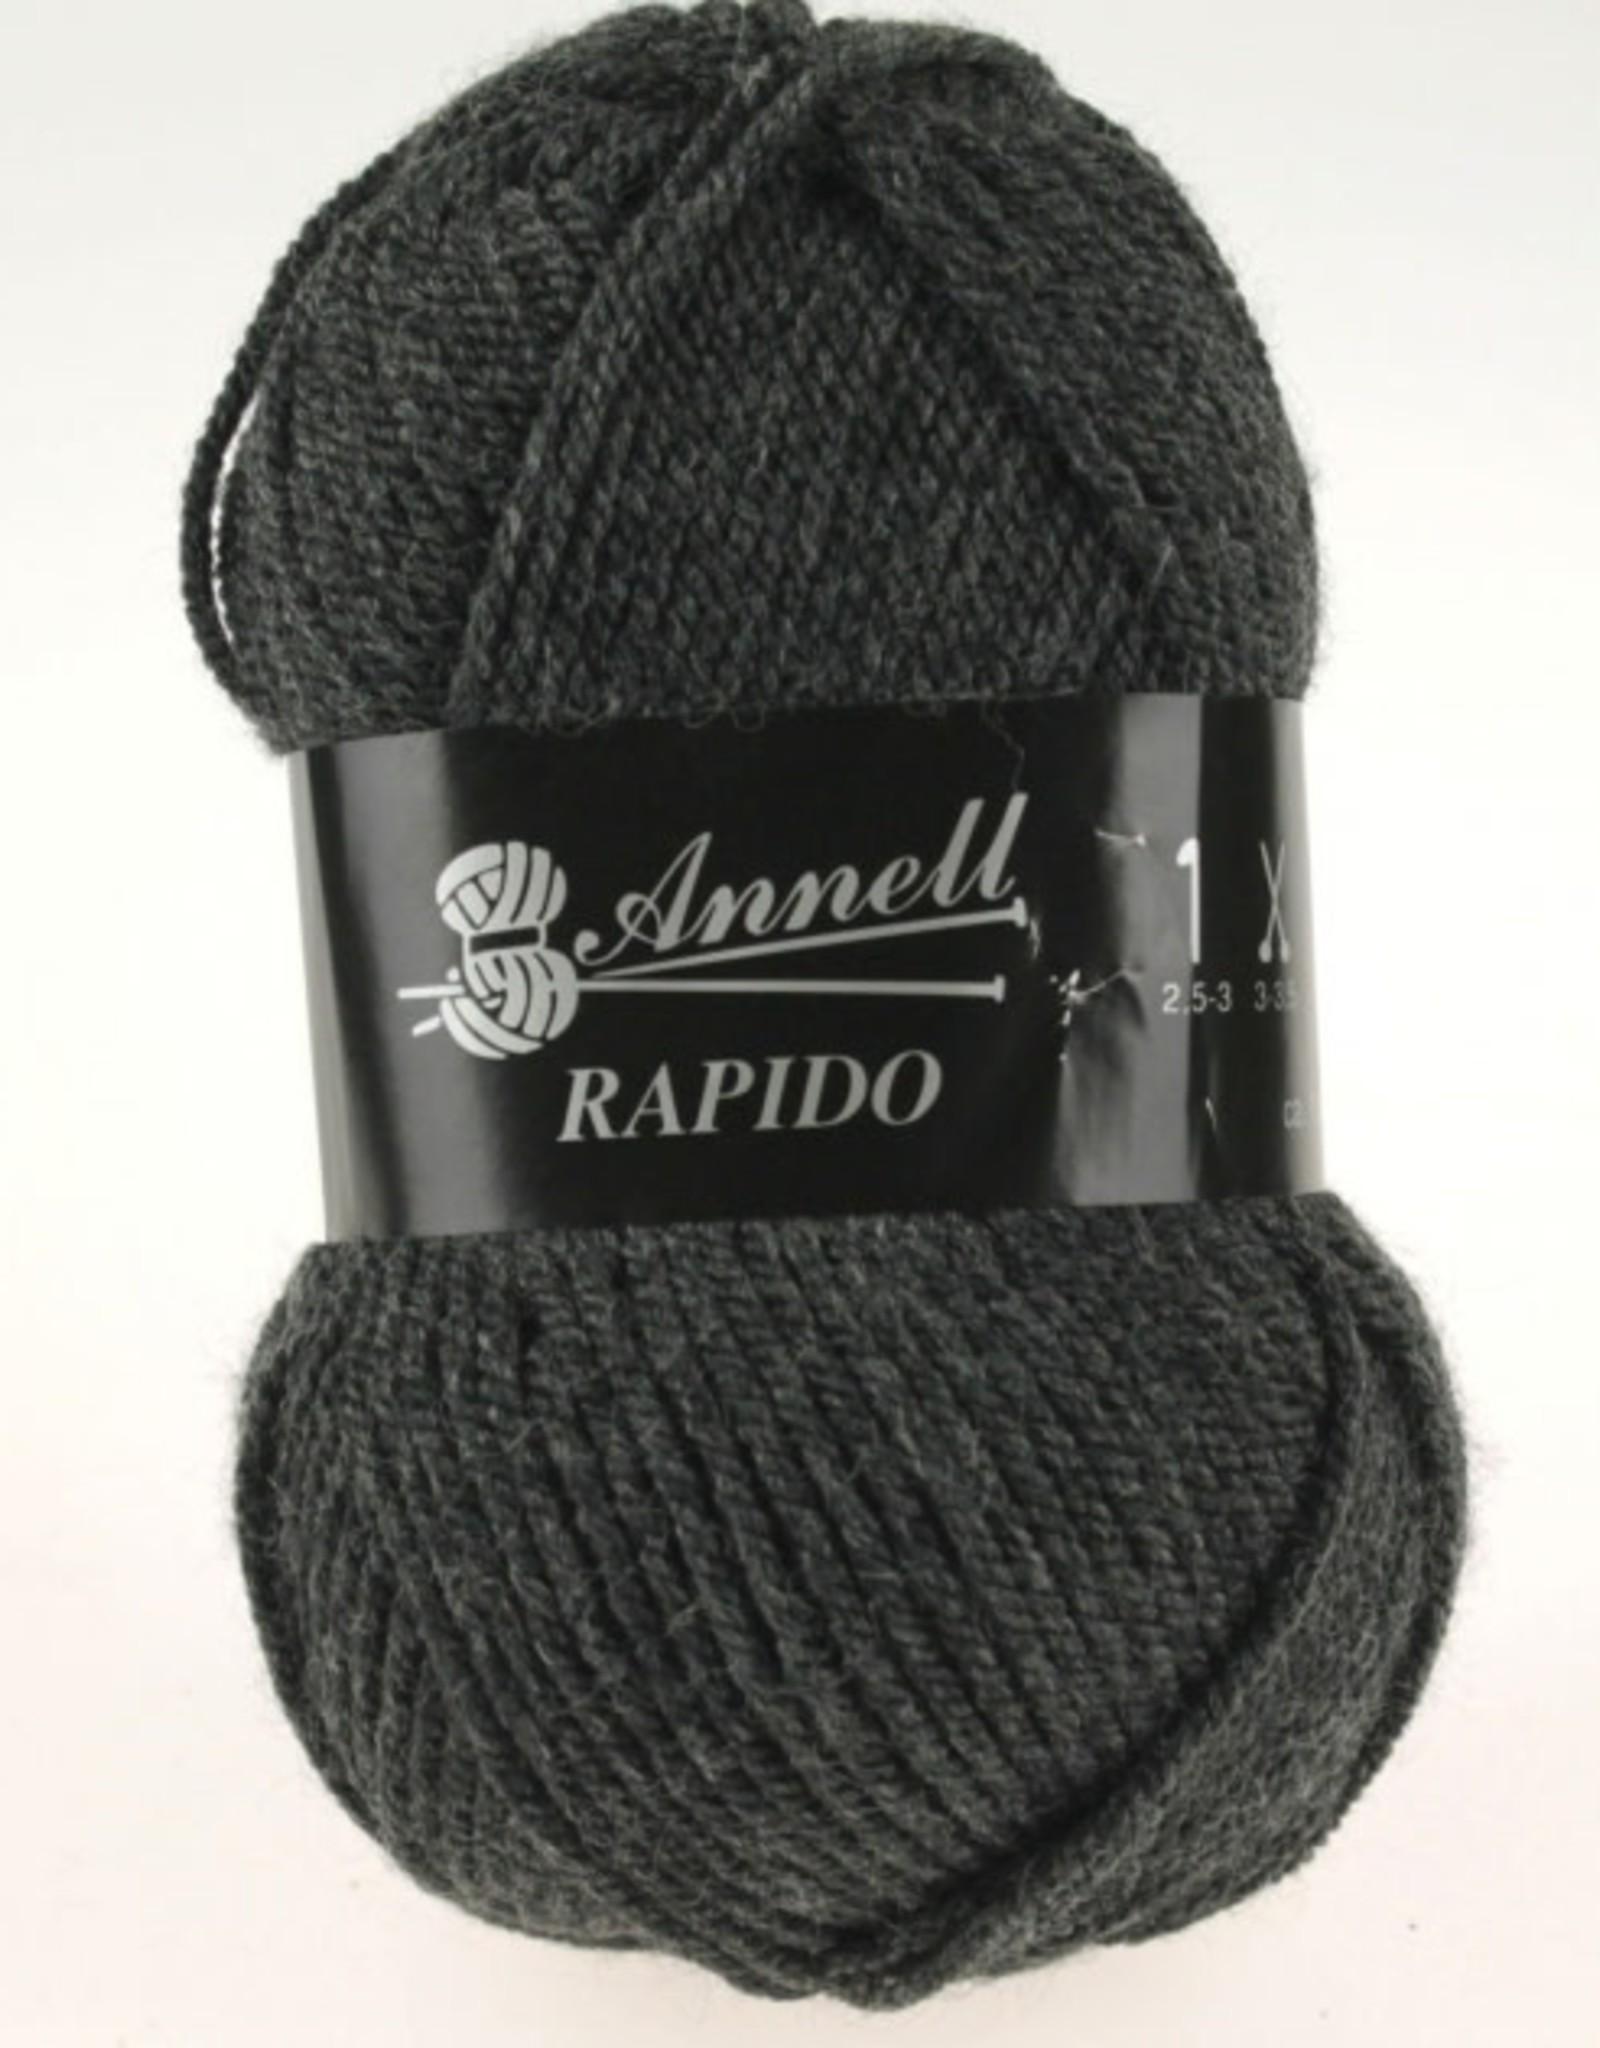 Annell Annell rapido 3358